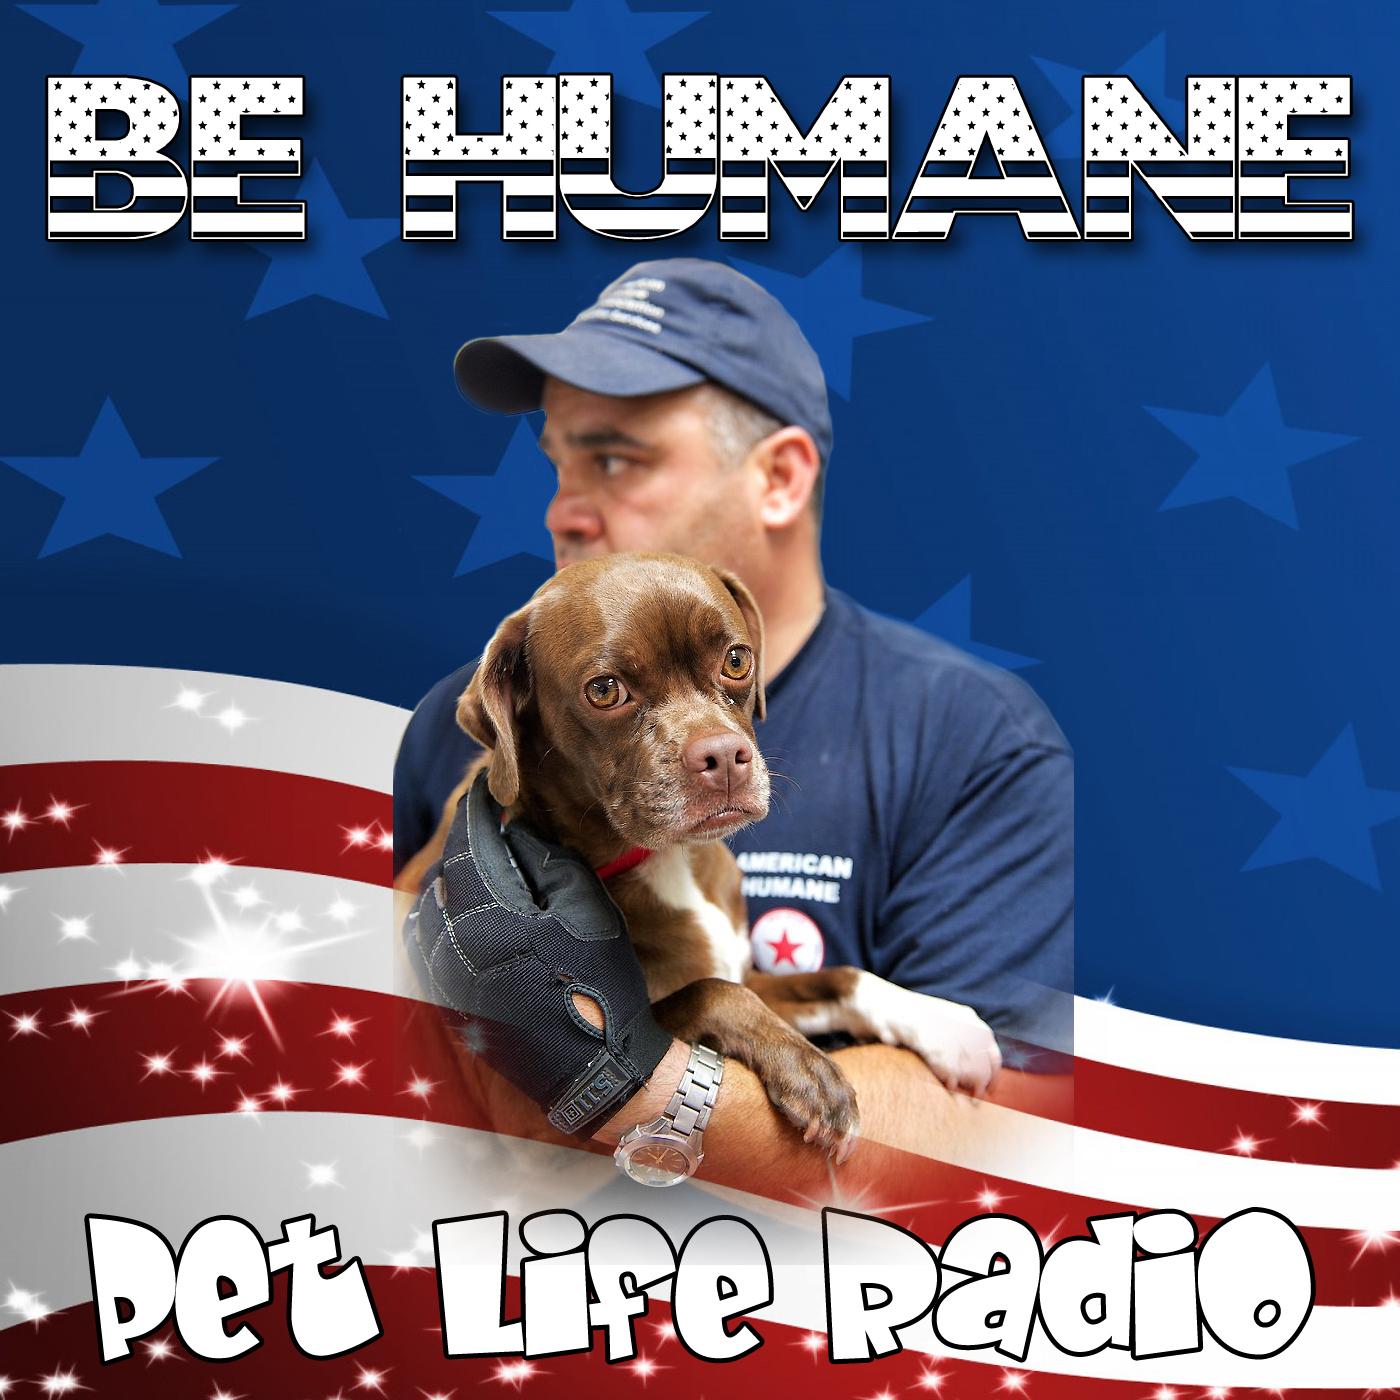 Be Humane on Pet Life Radio (PetLifeRadio.com)